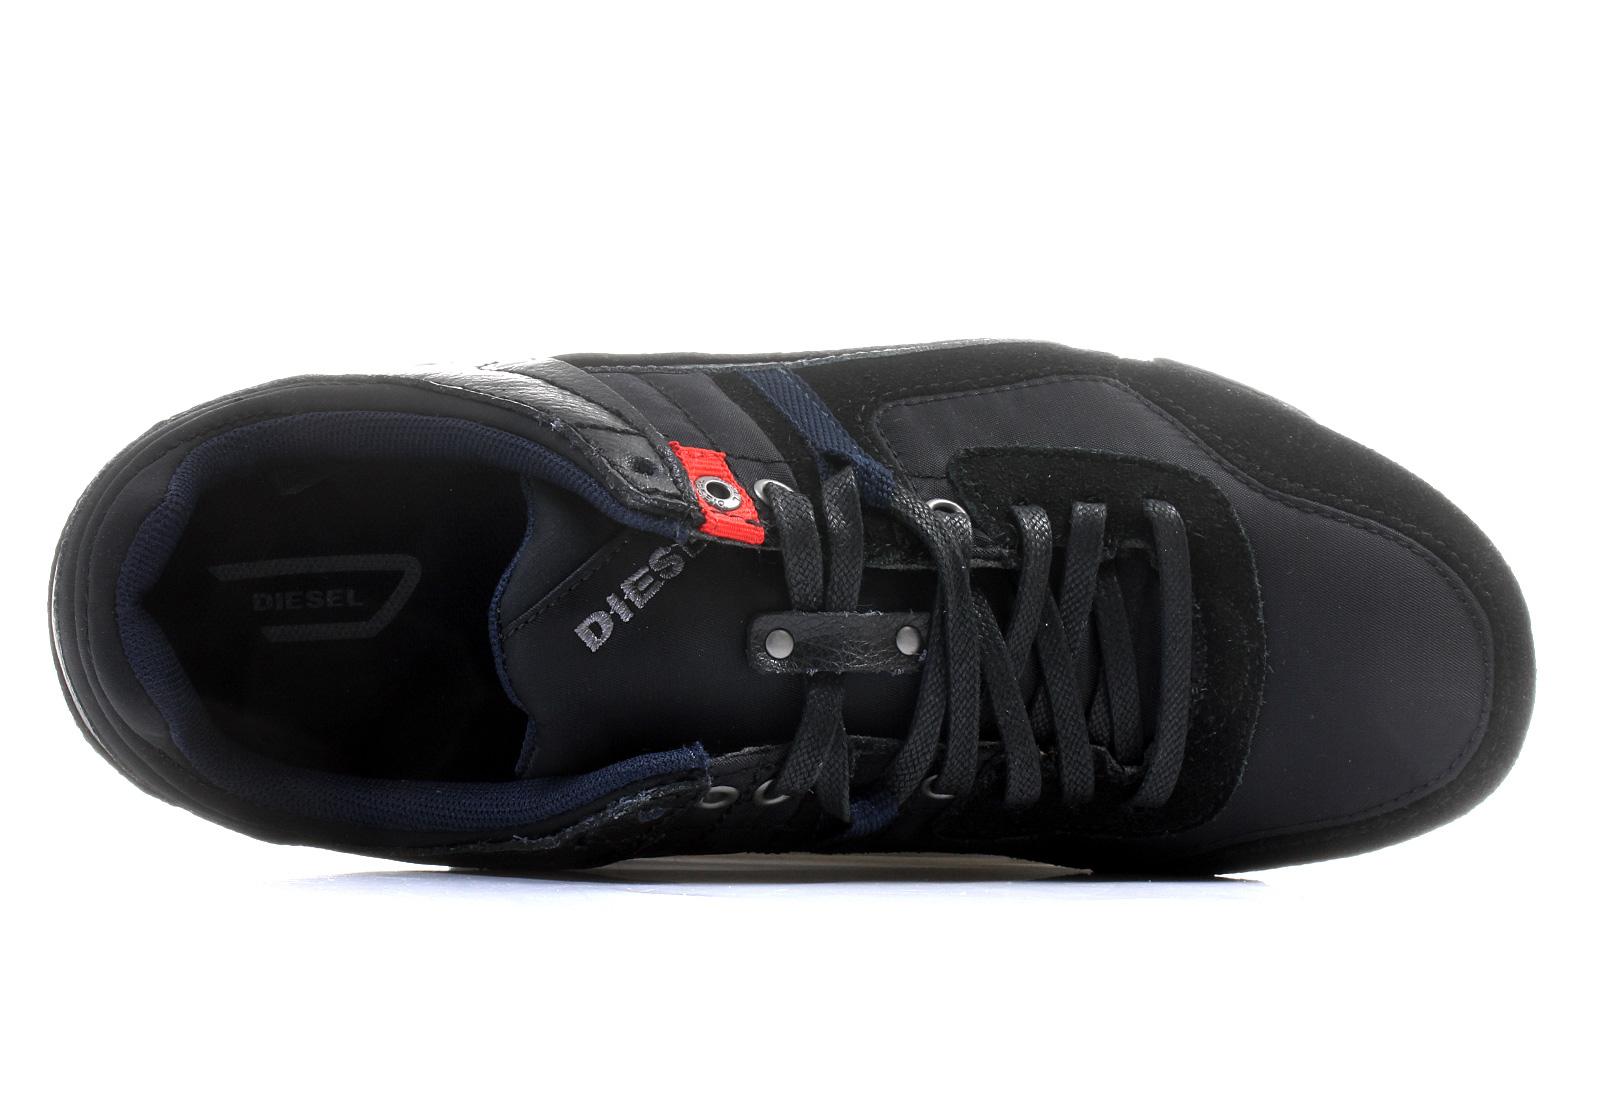 sale retailer b7d4d a79e5 Diesel Shoes - Korbin - 936-334-1554 - Online shop for sneakers, shoes and  boots